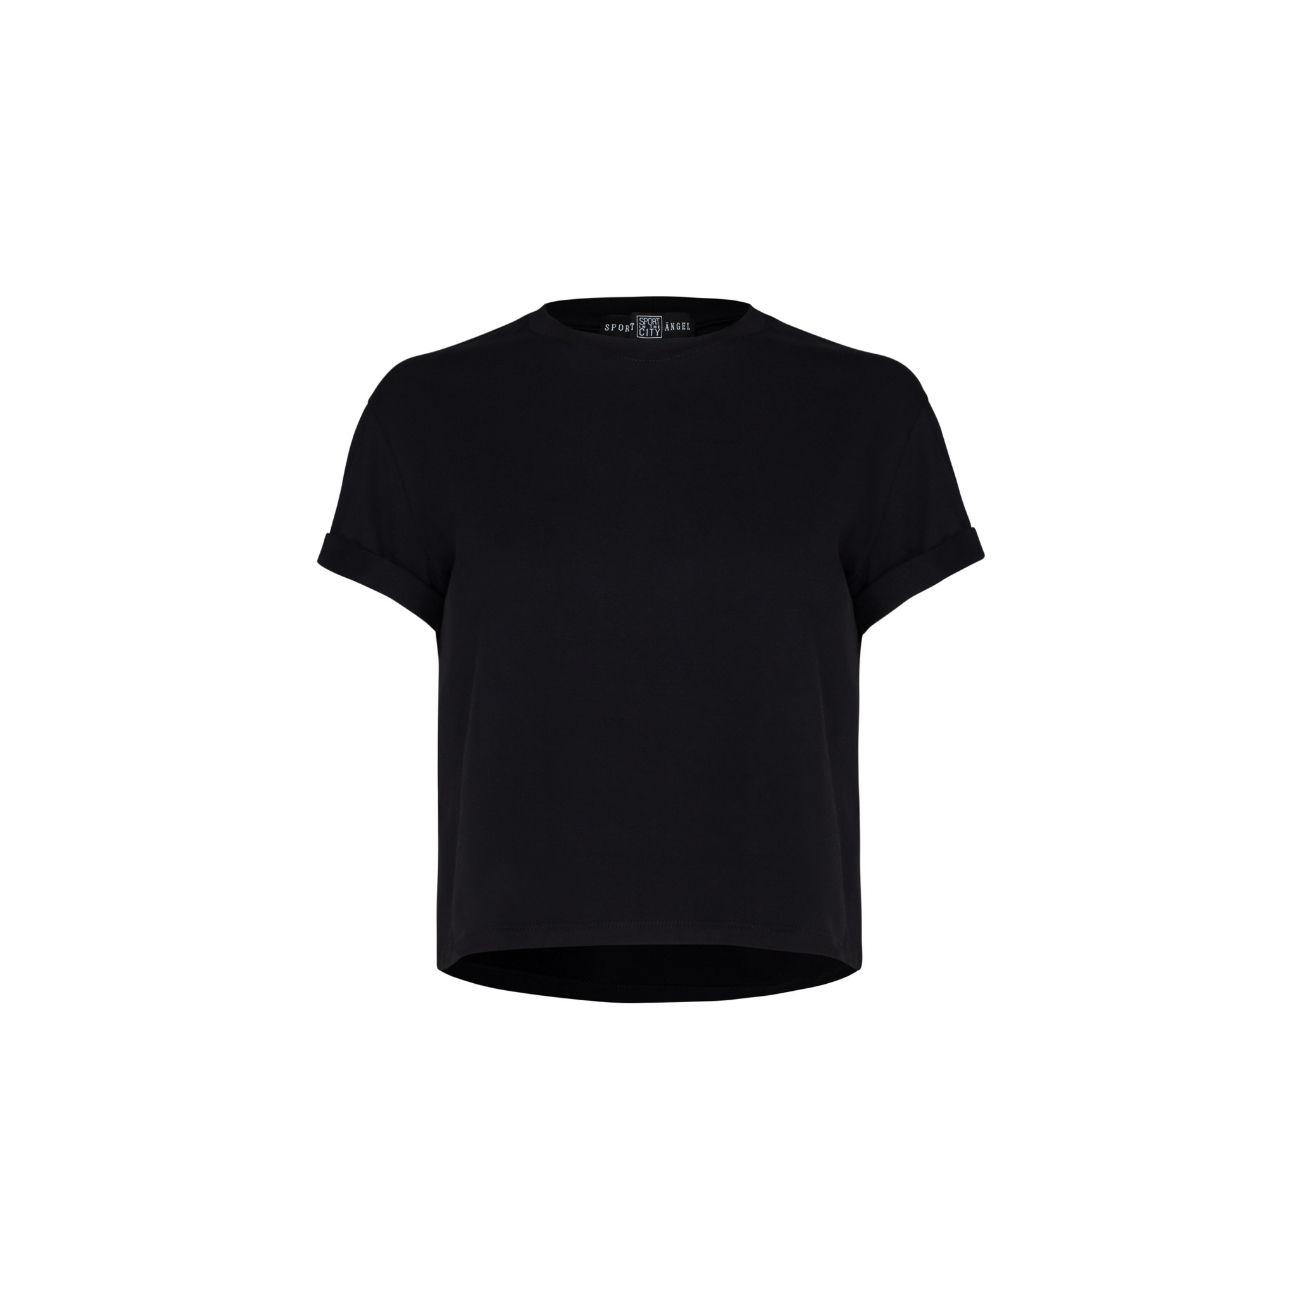 Sport Angel women's black t-shirt